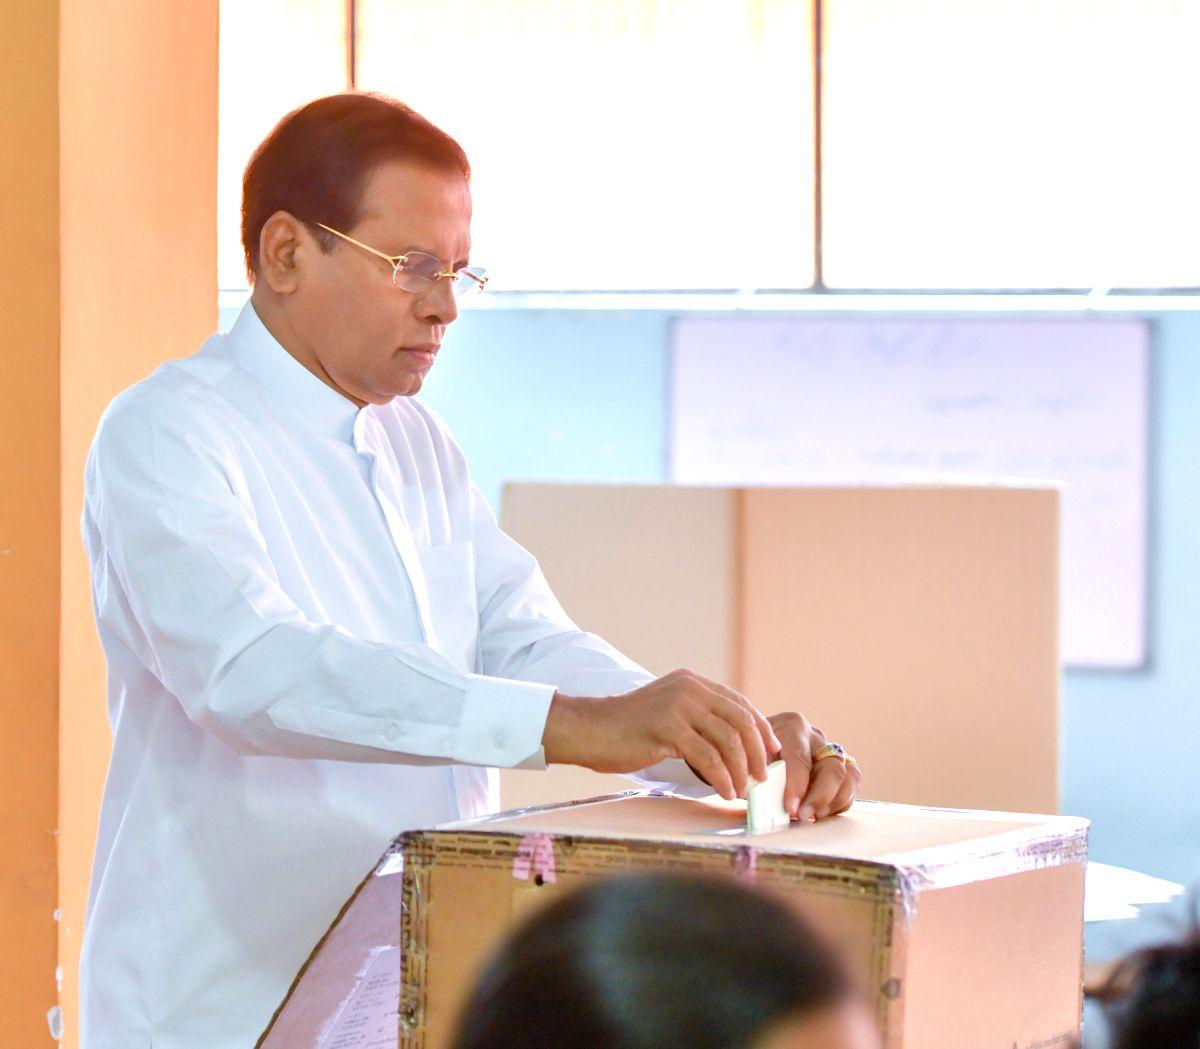 sri lankan elections - photo #34